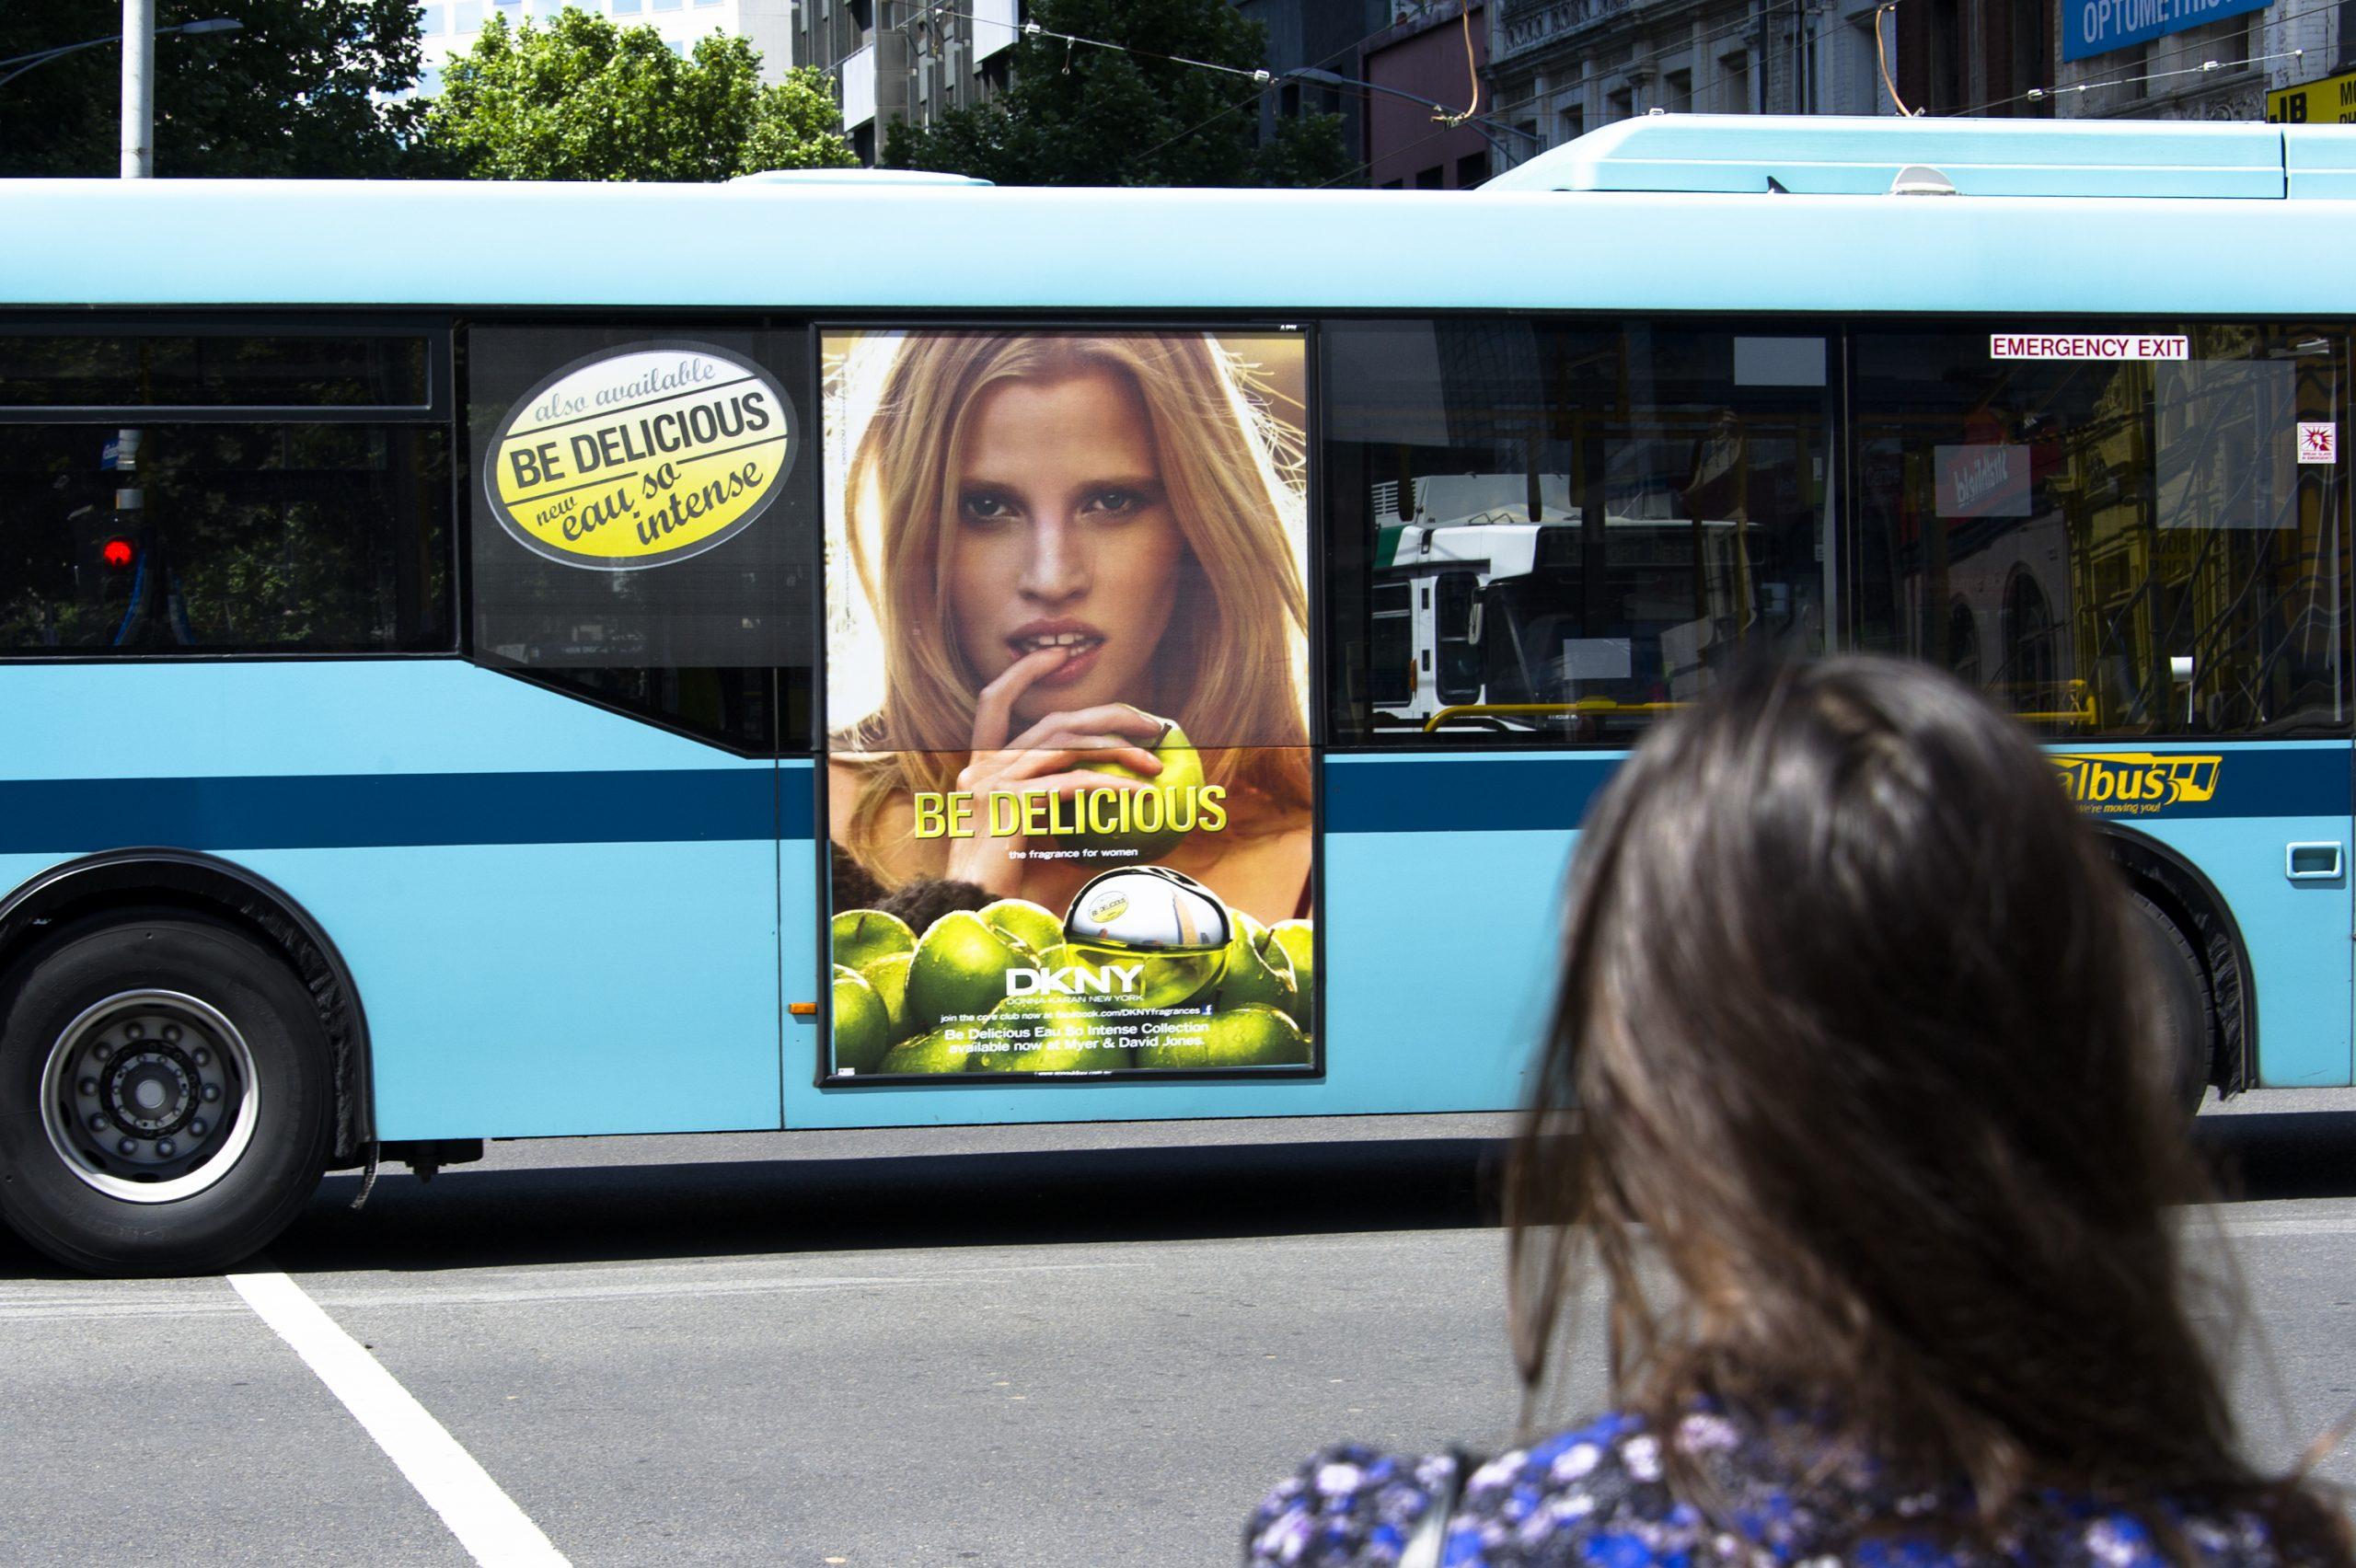 DKNY Portrait Bus Graphic Using Window Perf